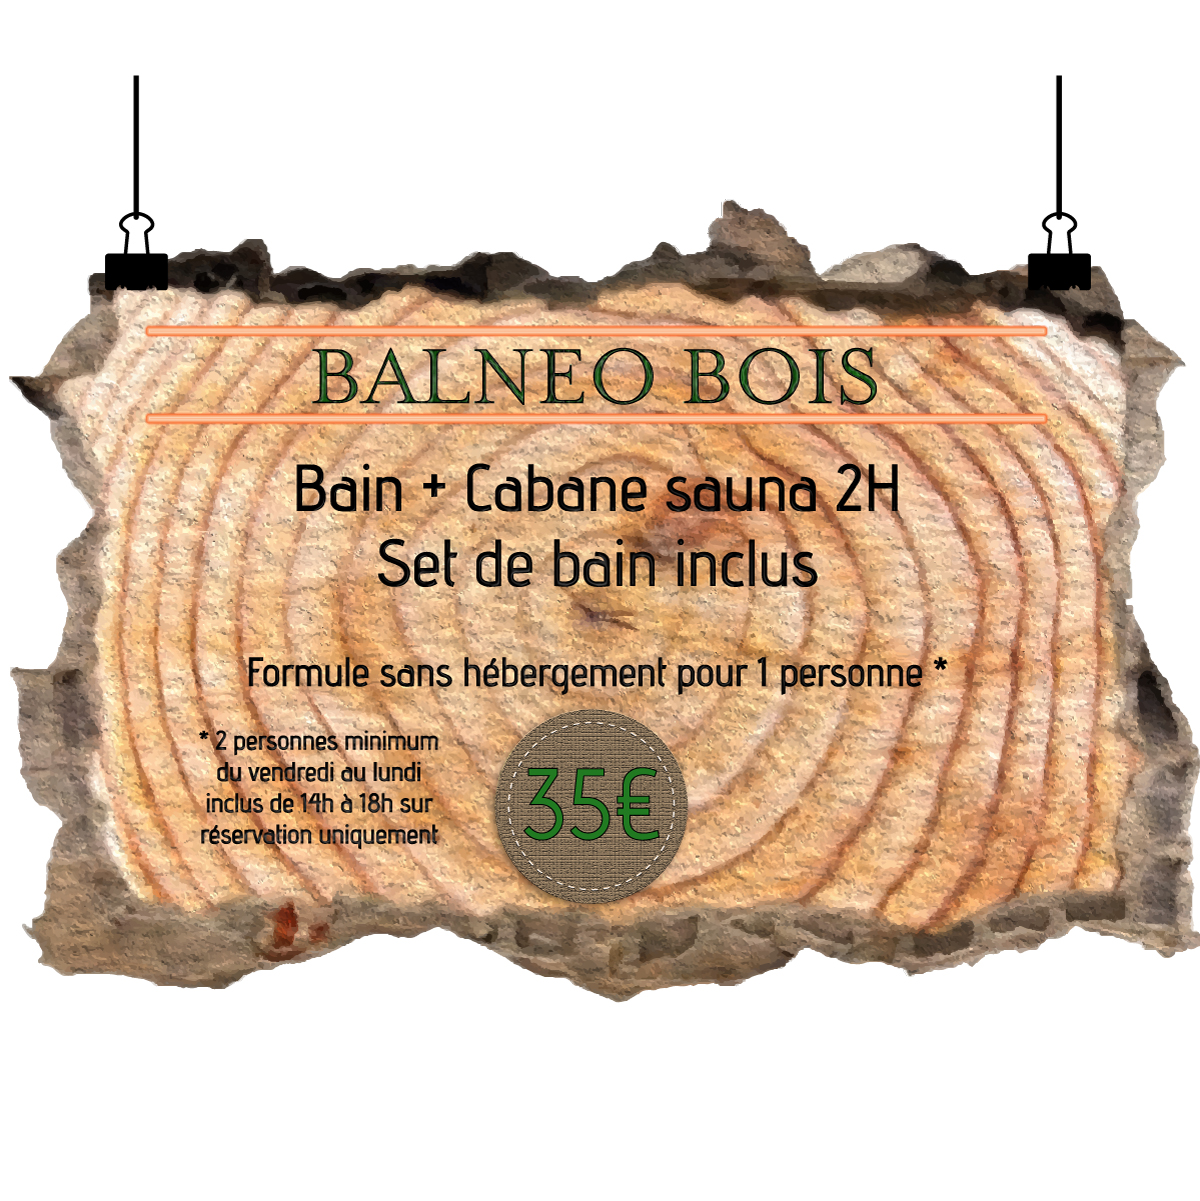 Bon cadeau balneo bois final